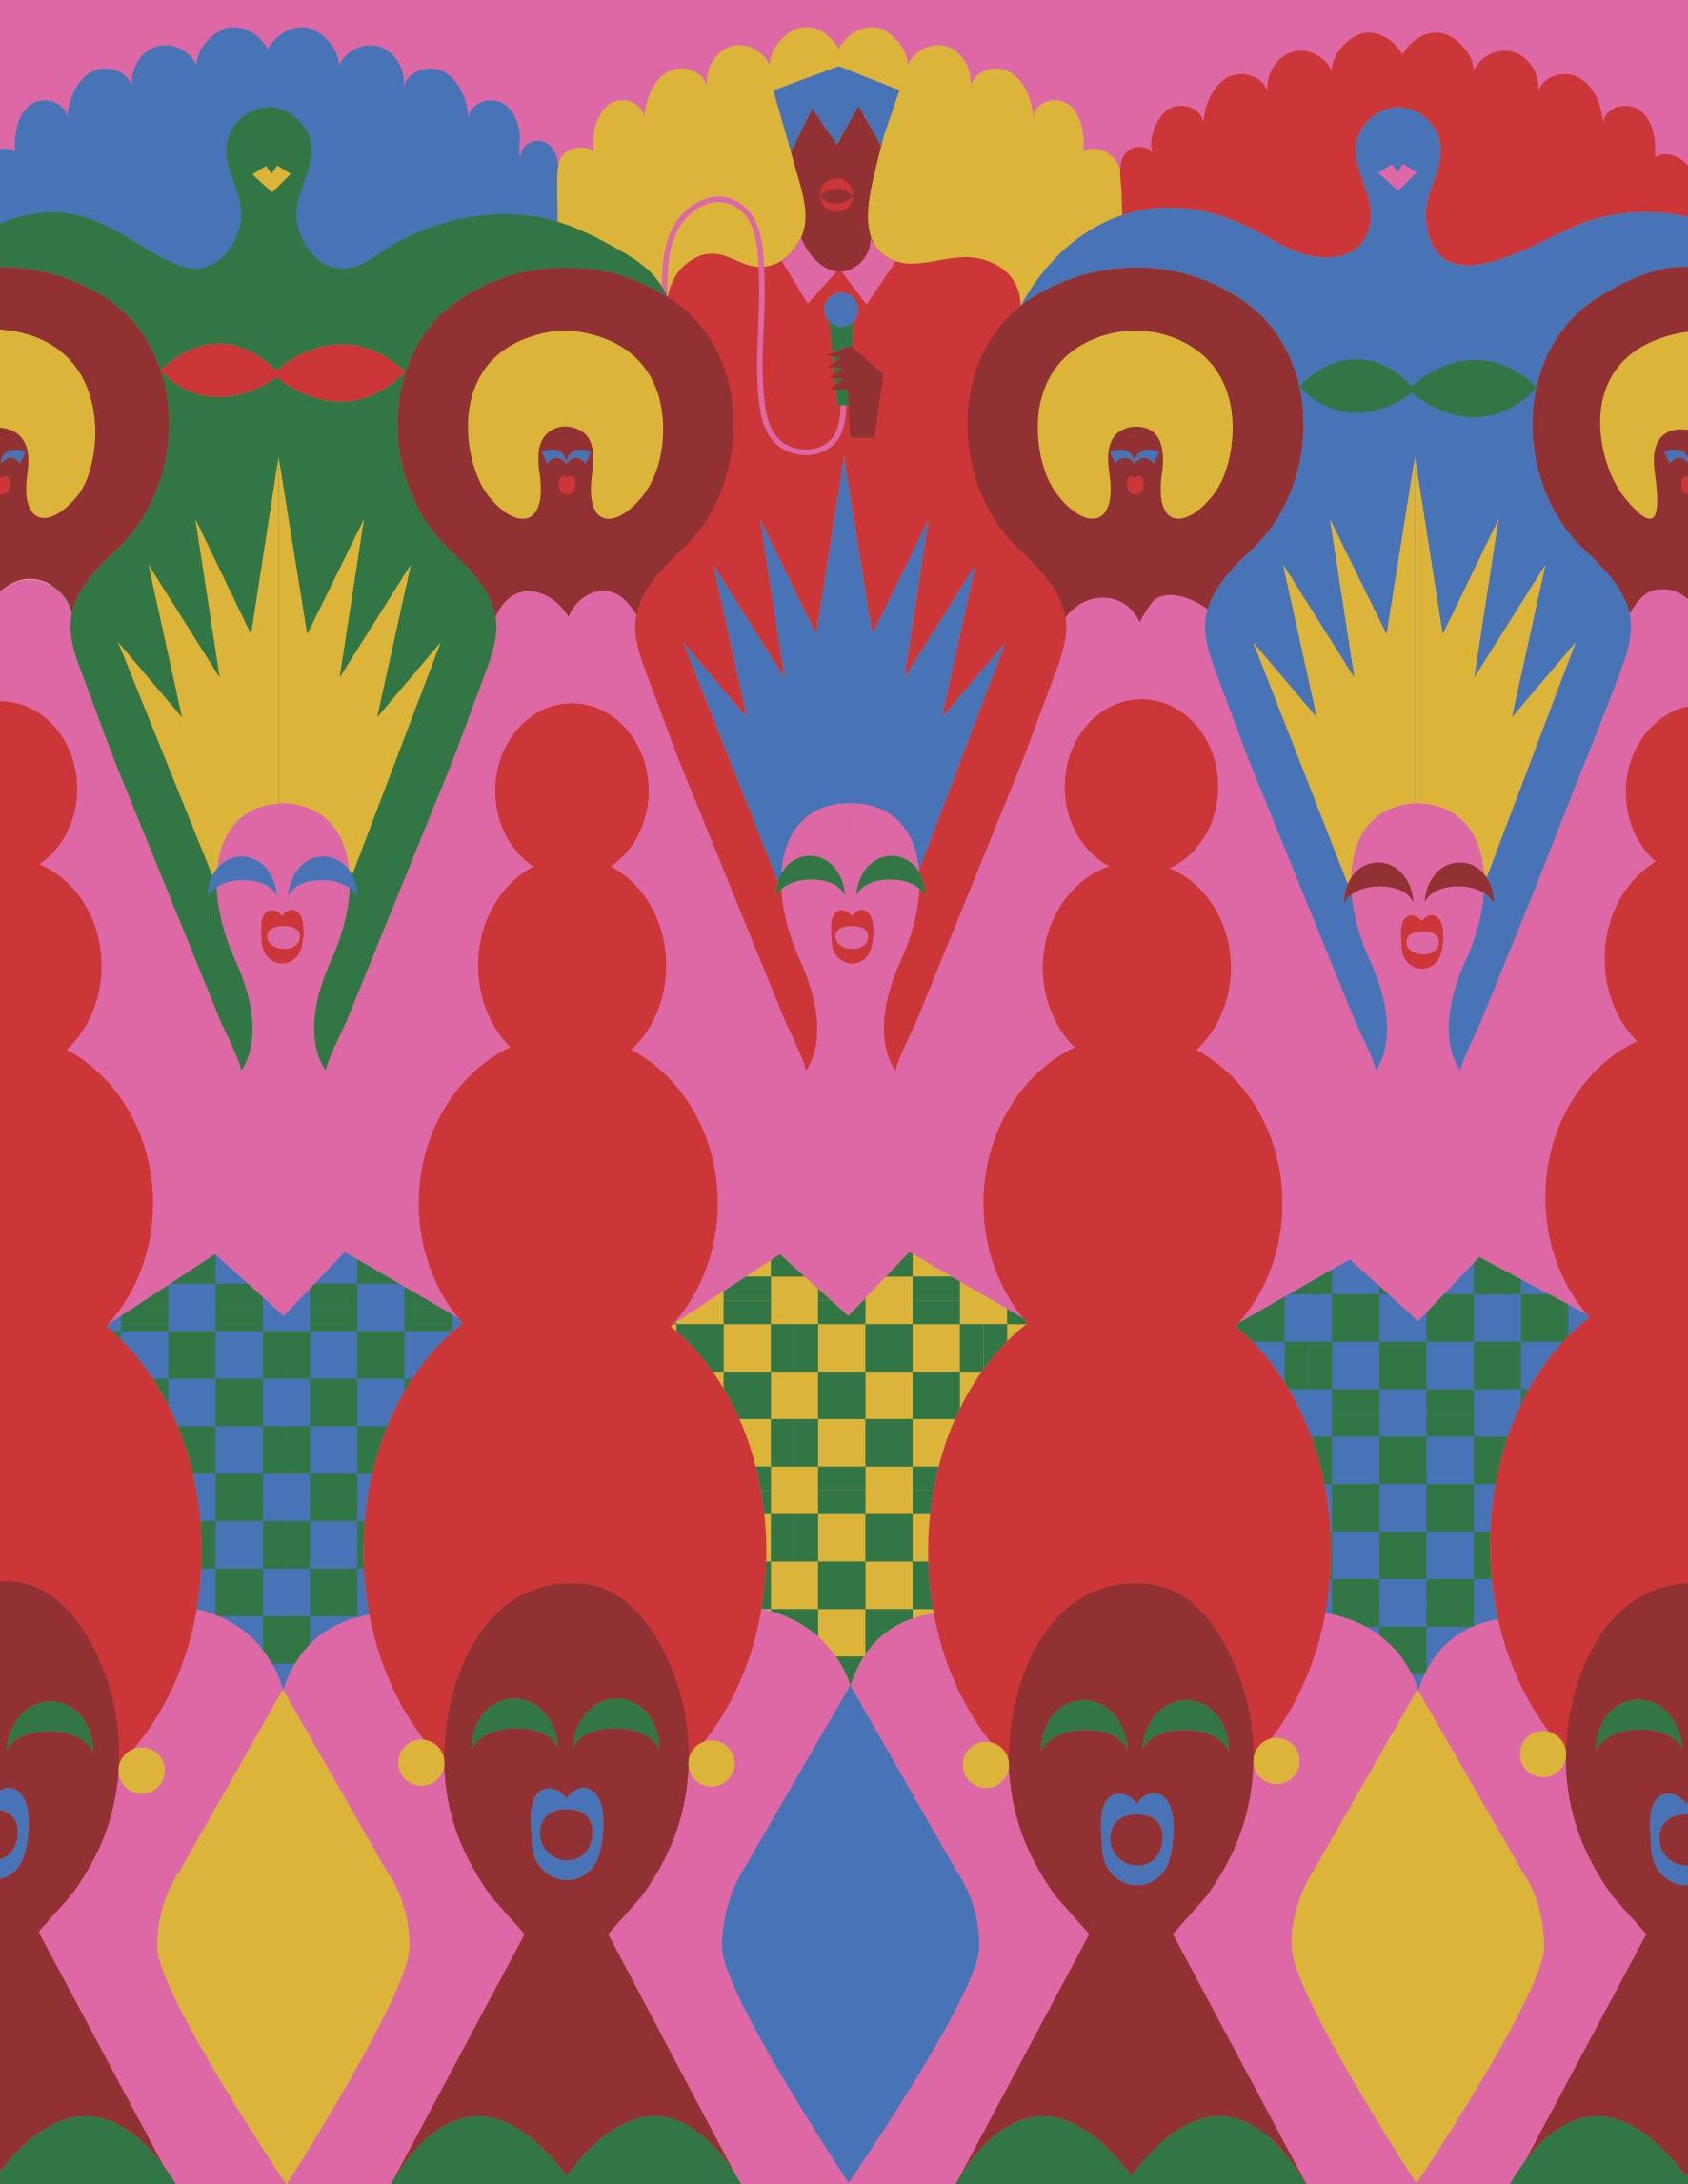 Olimpia Zagnoli, Dance Dance Dance, The New Yorker, 2017